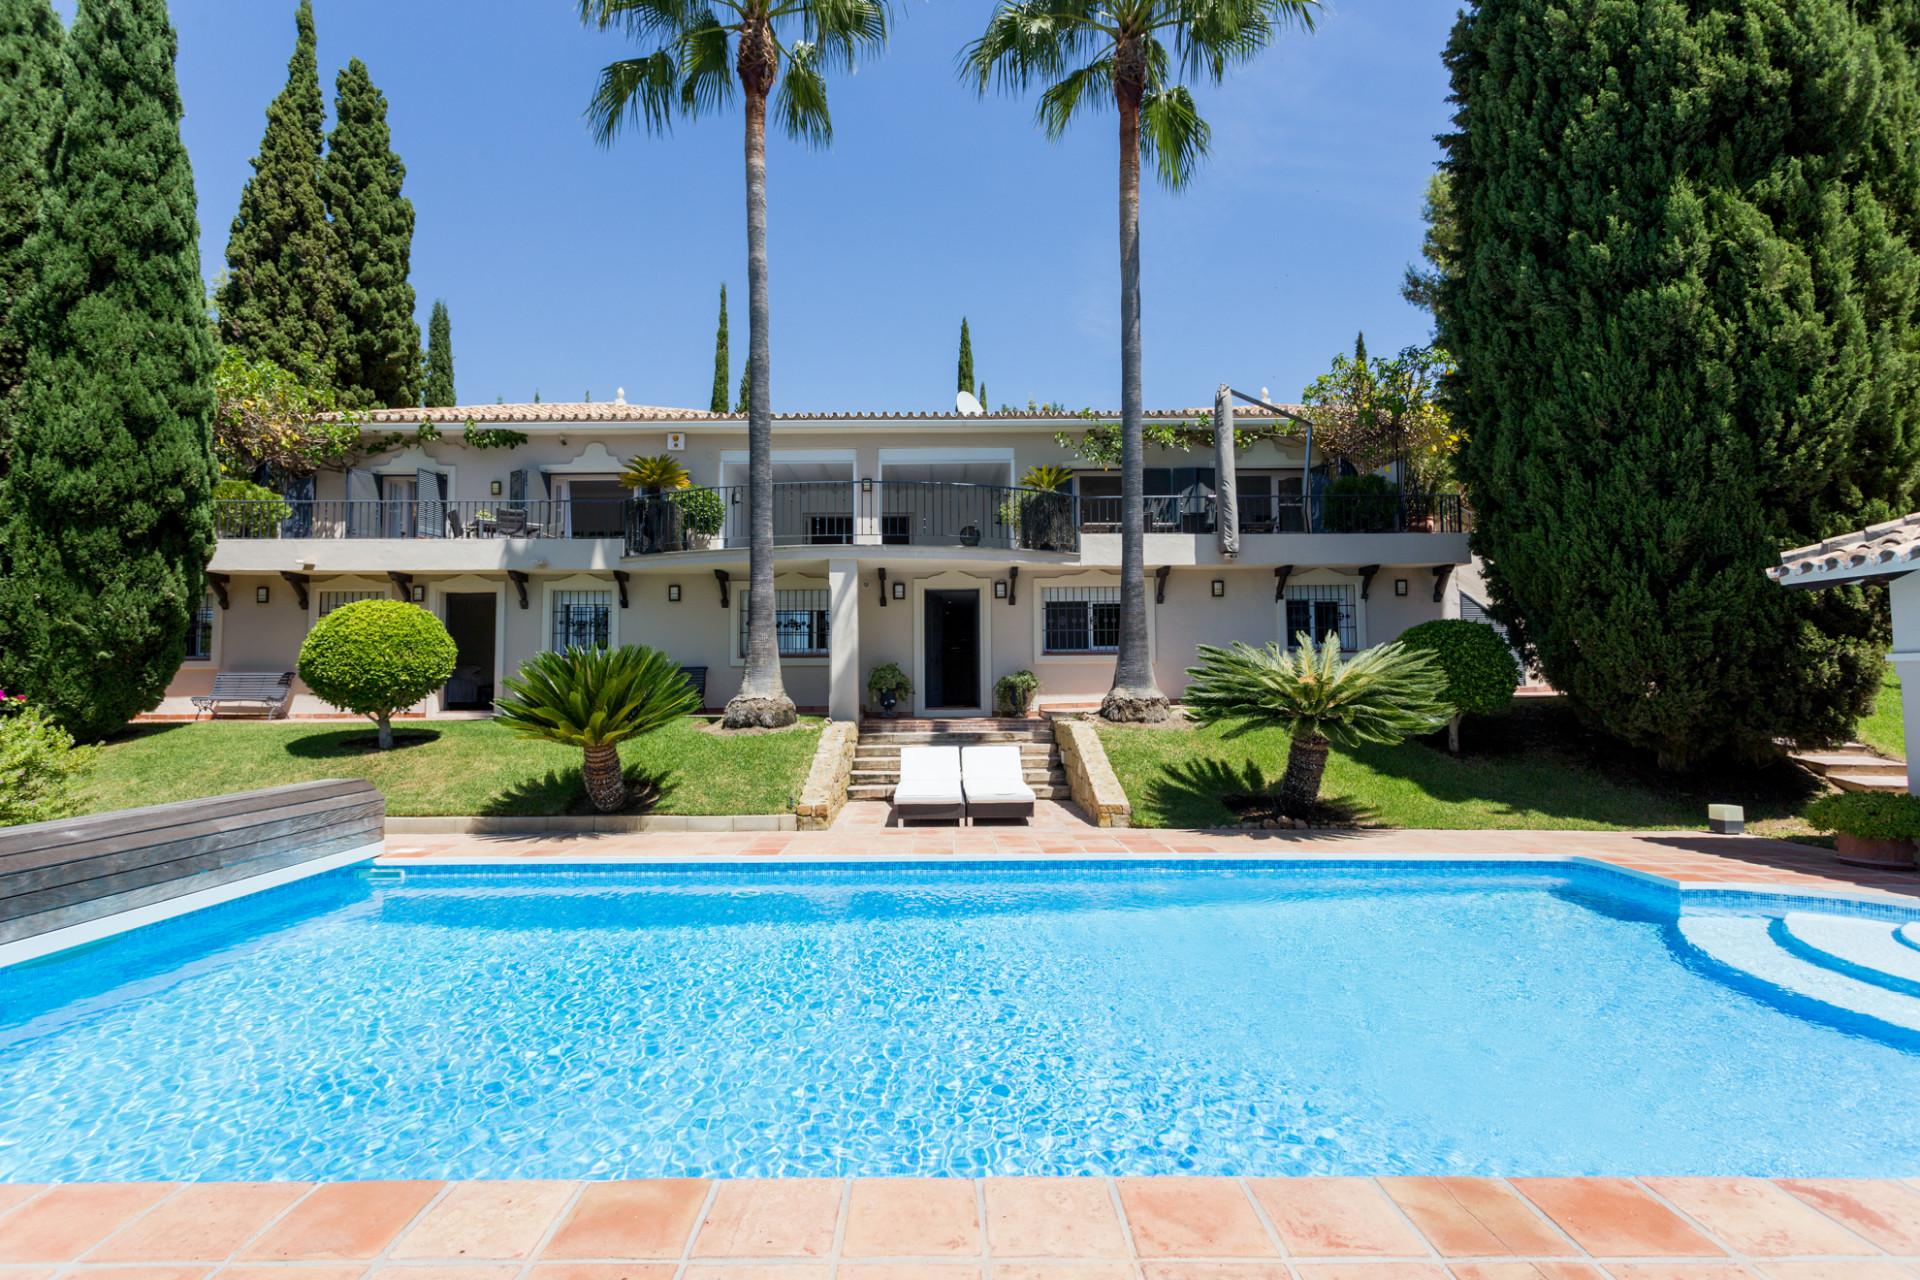 Renovated villa for sale in Puerto del Almendro – Benahavis